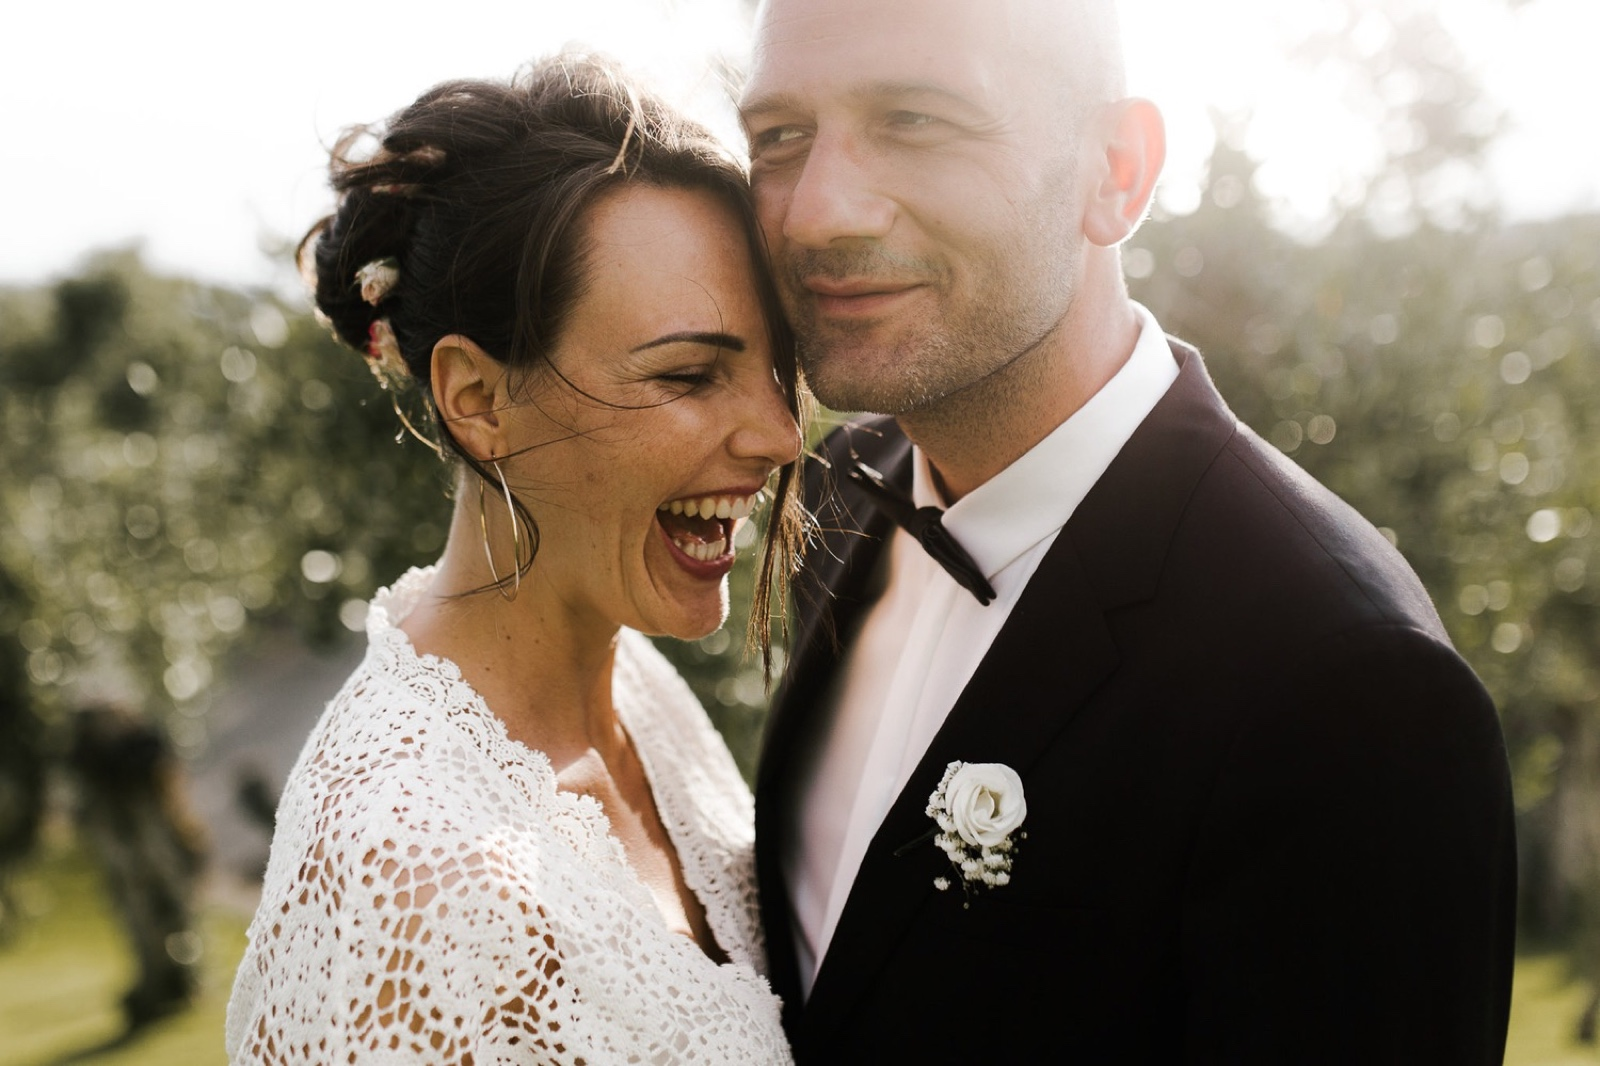 Fotomagoria Best 0f 2018 Wedding Photographer Italy86.jpg